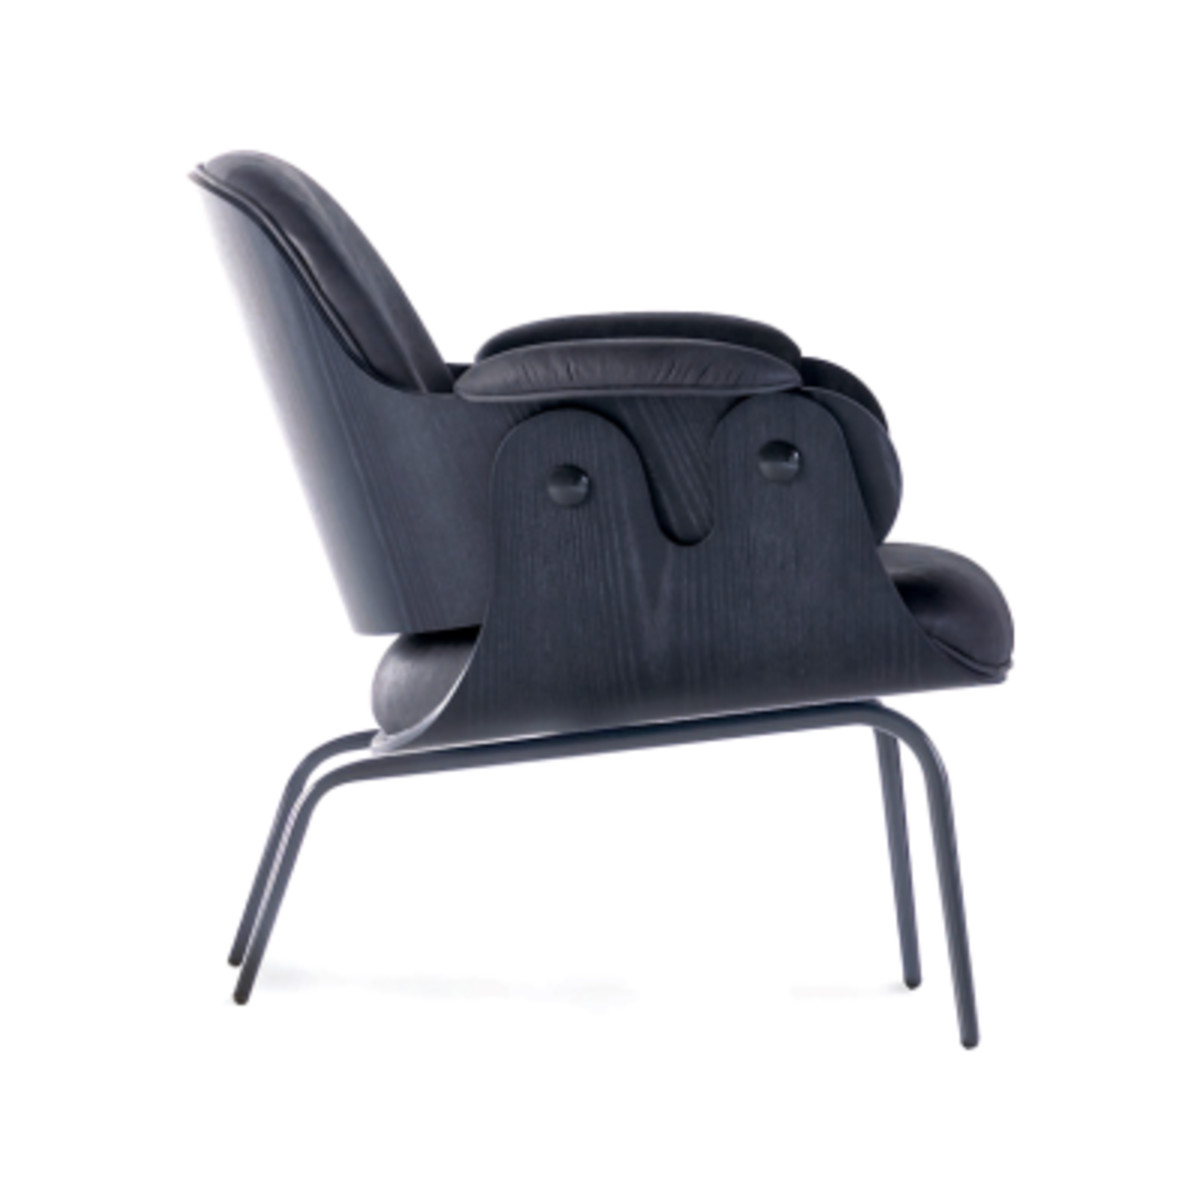 Brilliant Low Lounger Armchair Swivel Base Set Of 2 Bd Barcelona Creativecarmelina Interior Chair Design Creativecarmelinacom